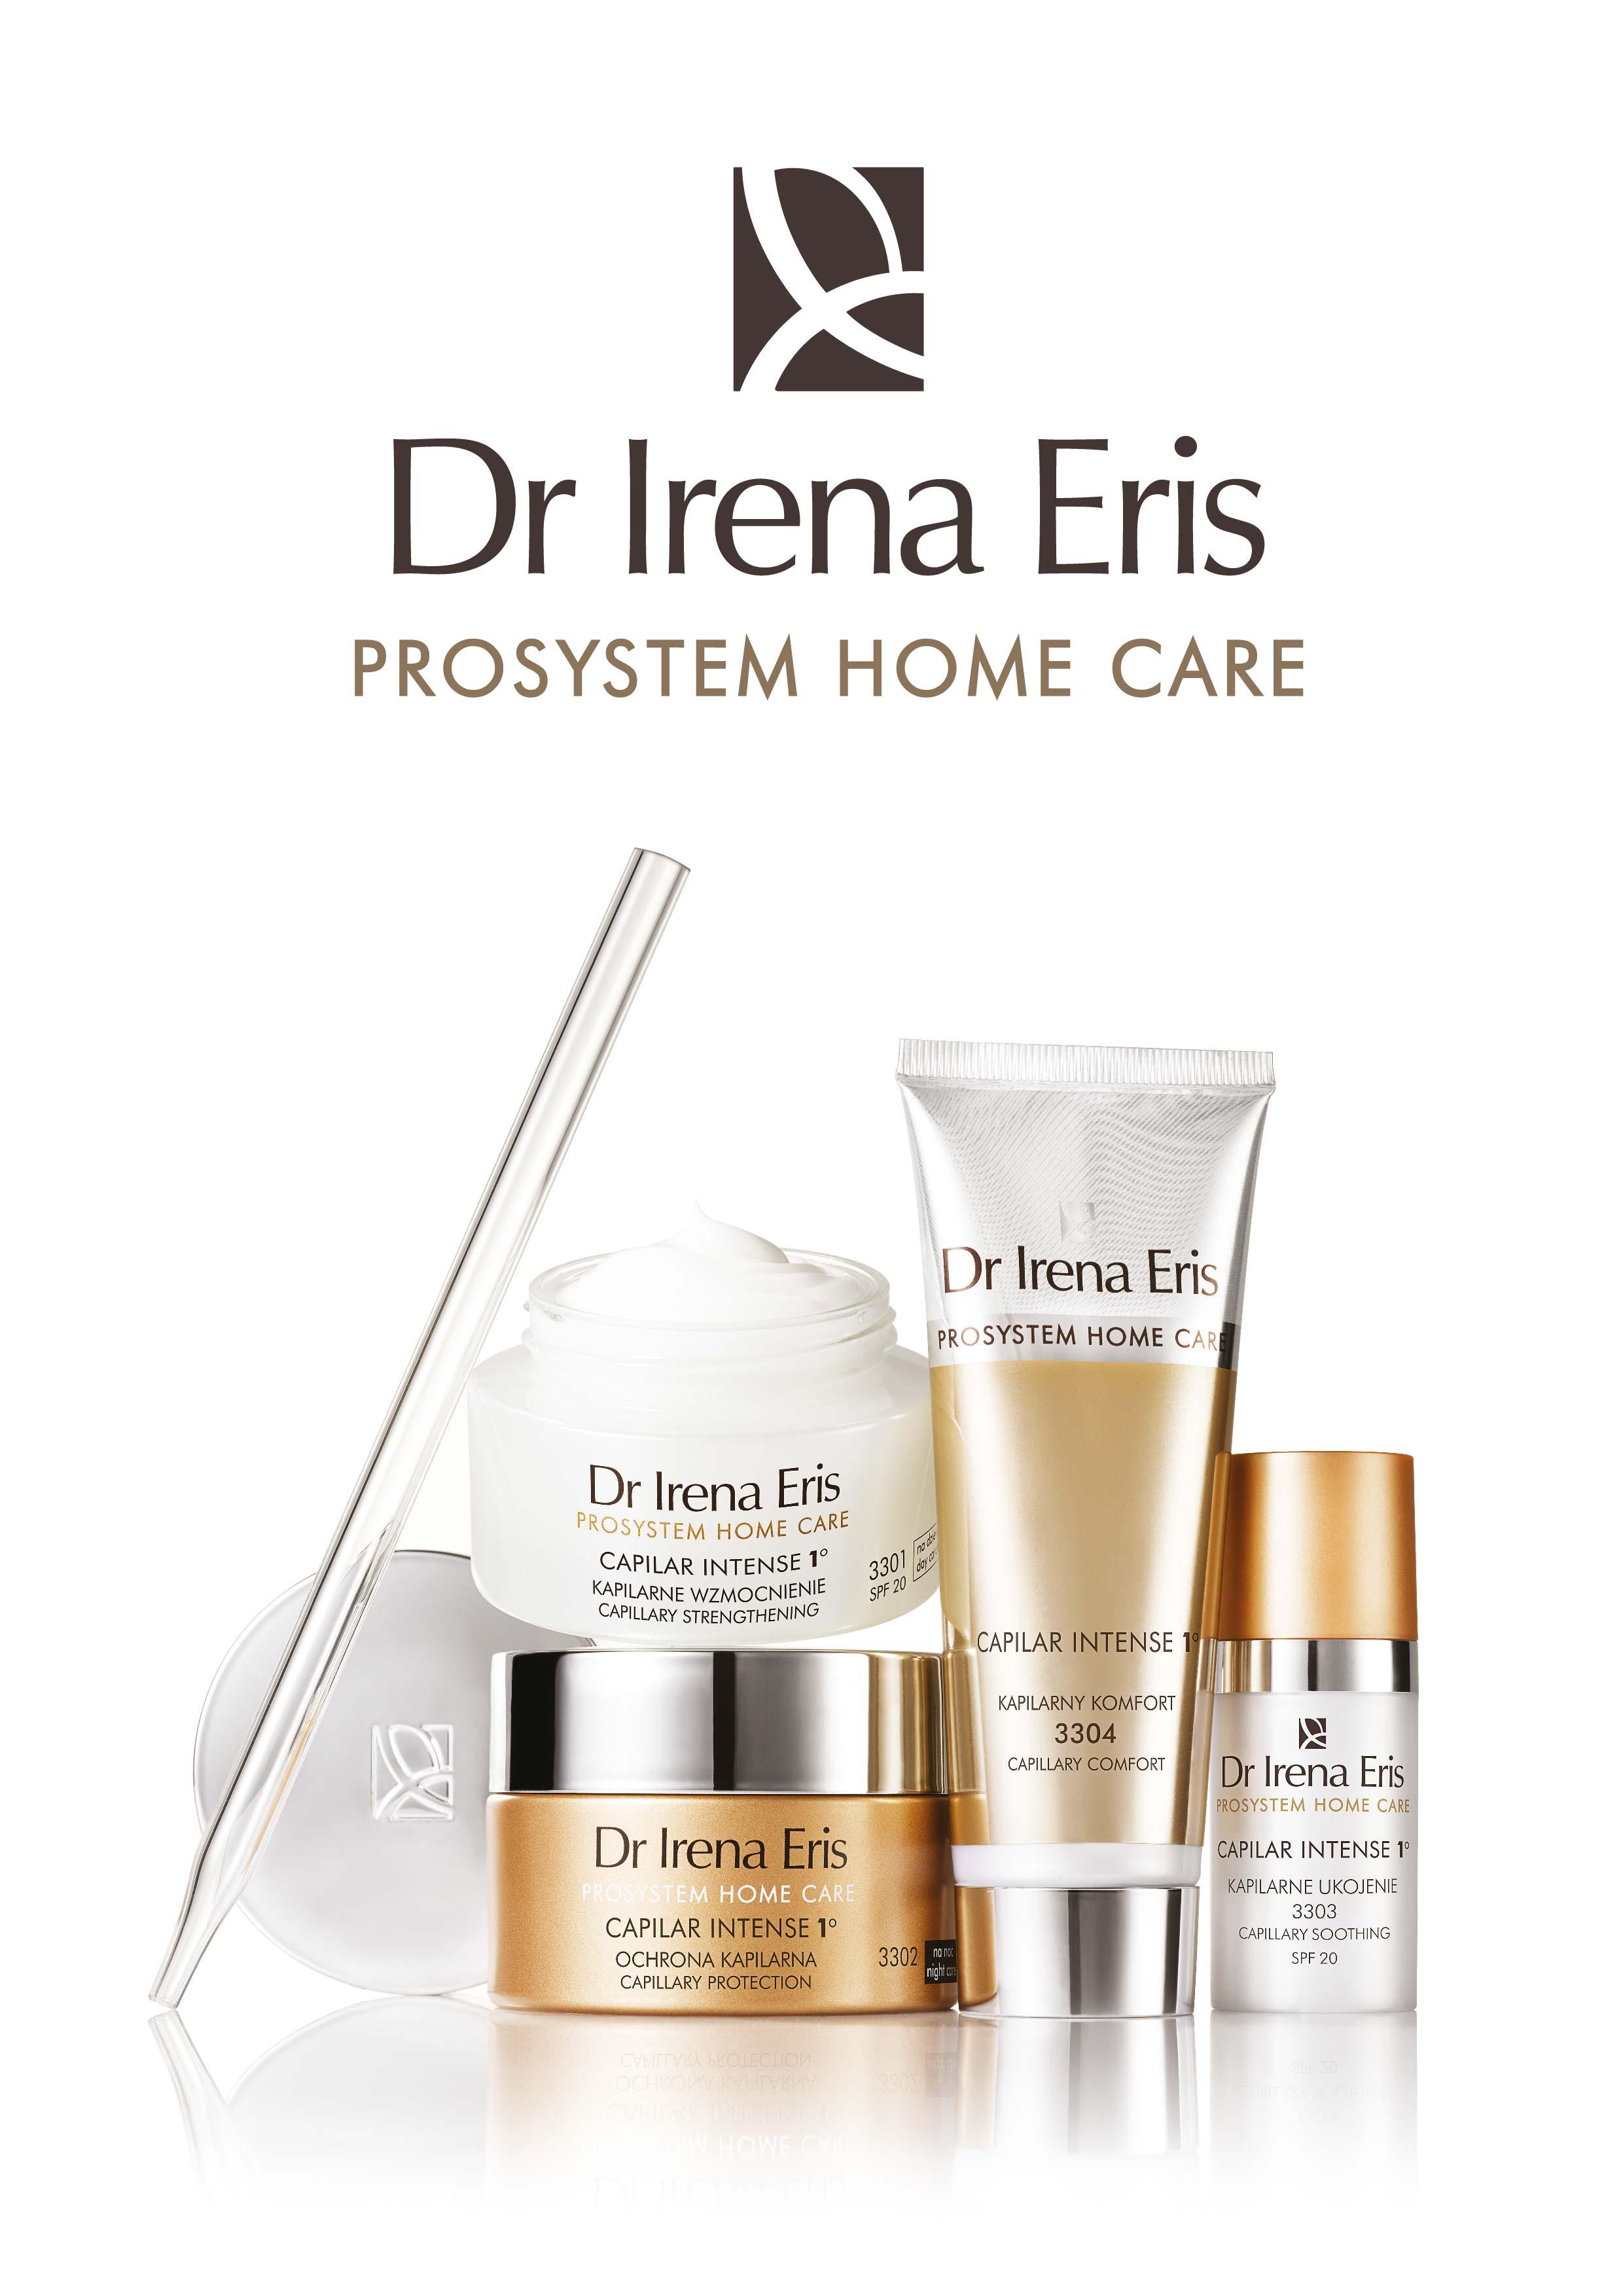 Dr Irena Eris Prosystem